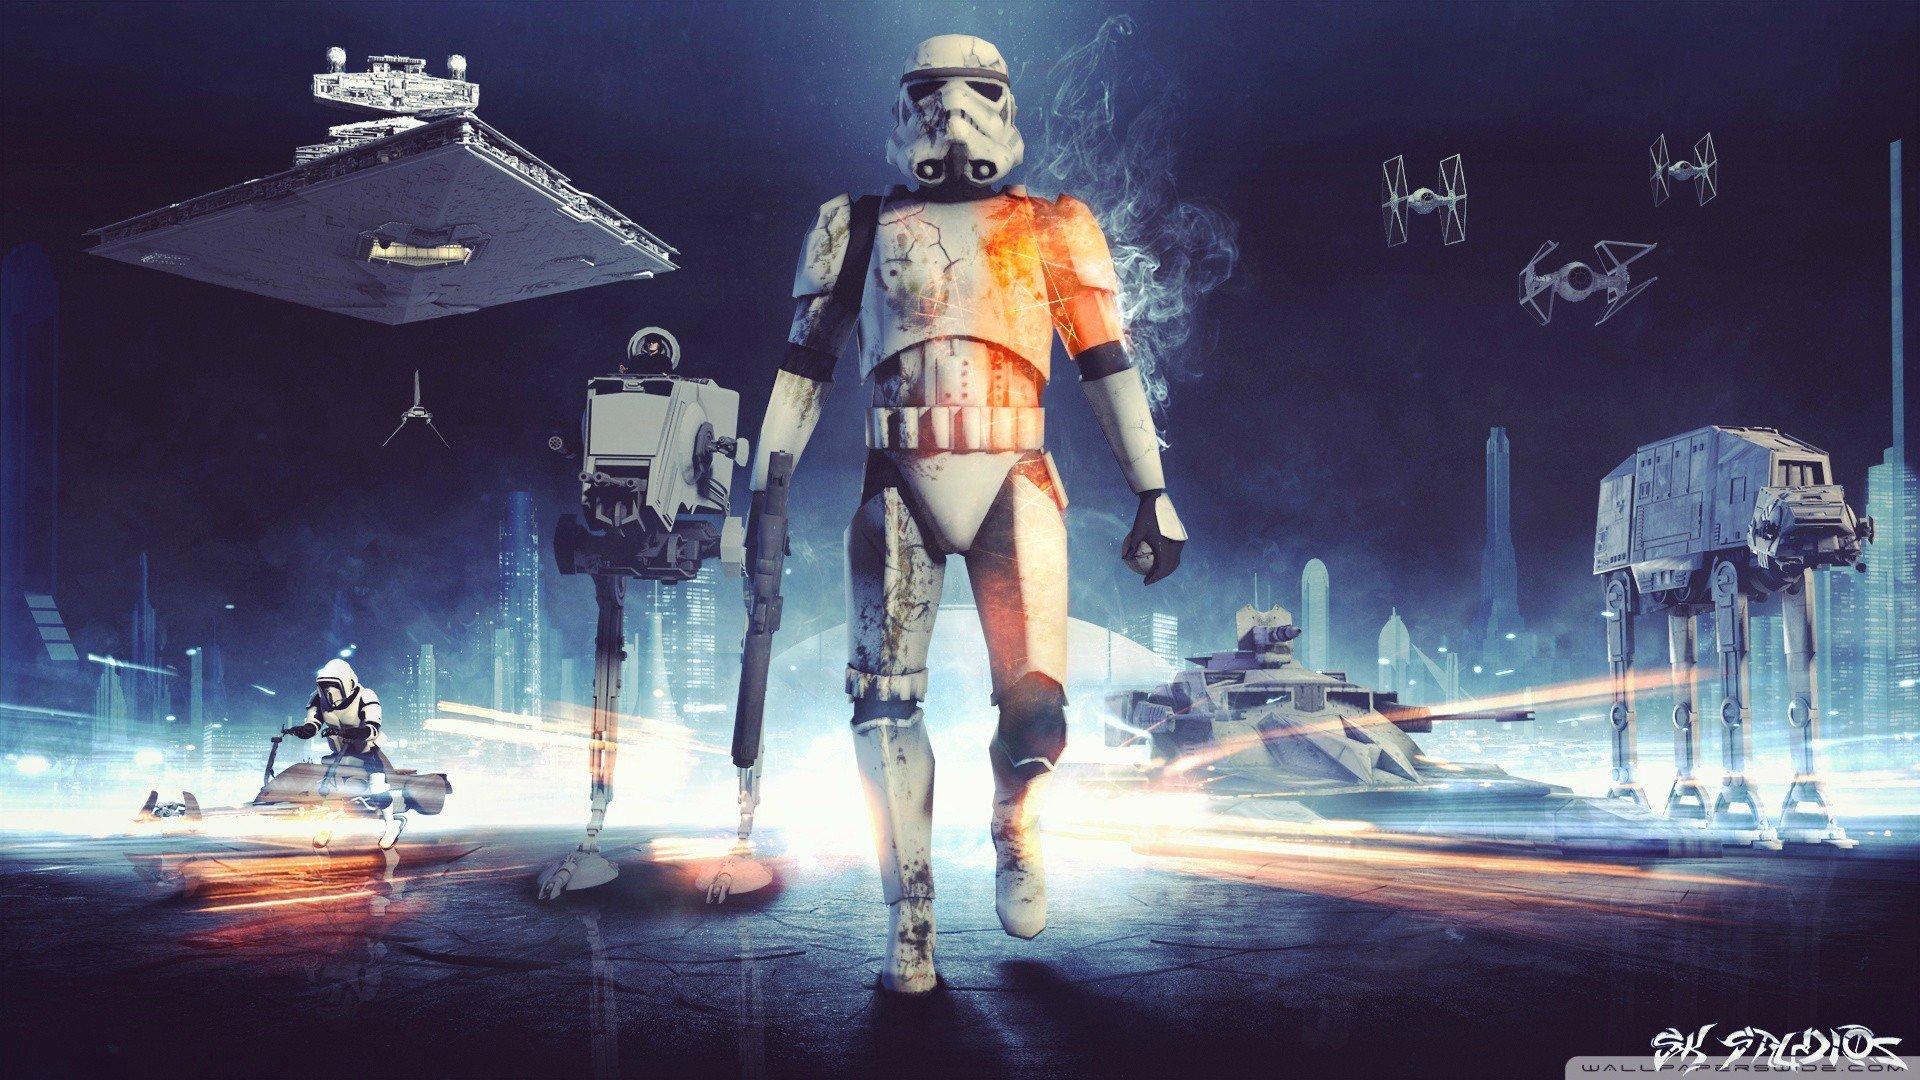 Star wars battlefront 2battlefield 4 wallpaper My favourite gaming 1920x1080